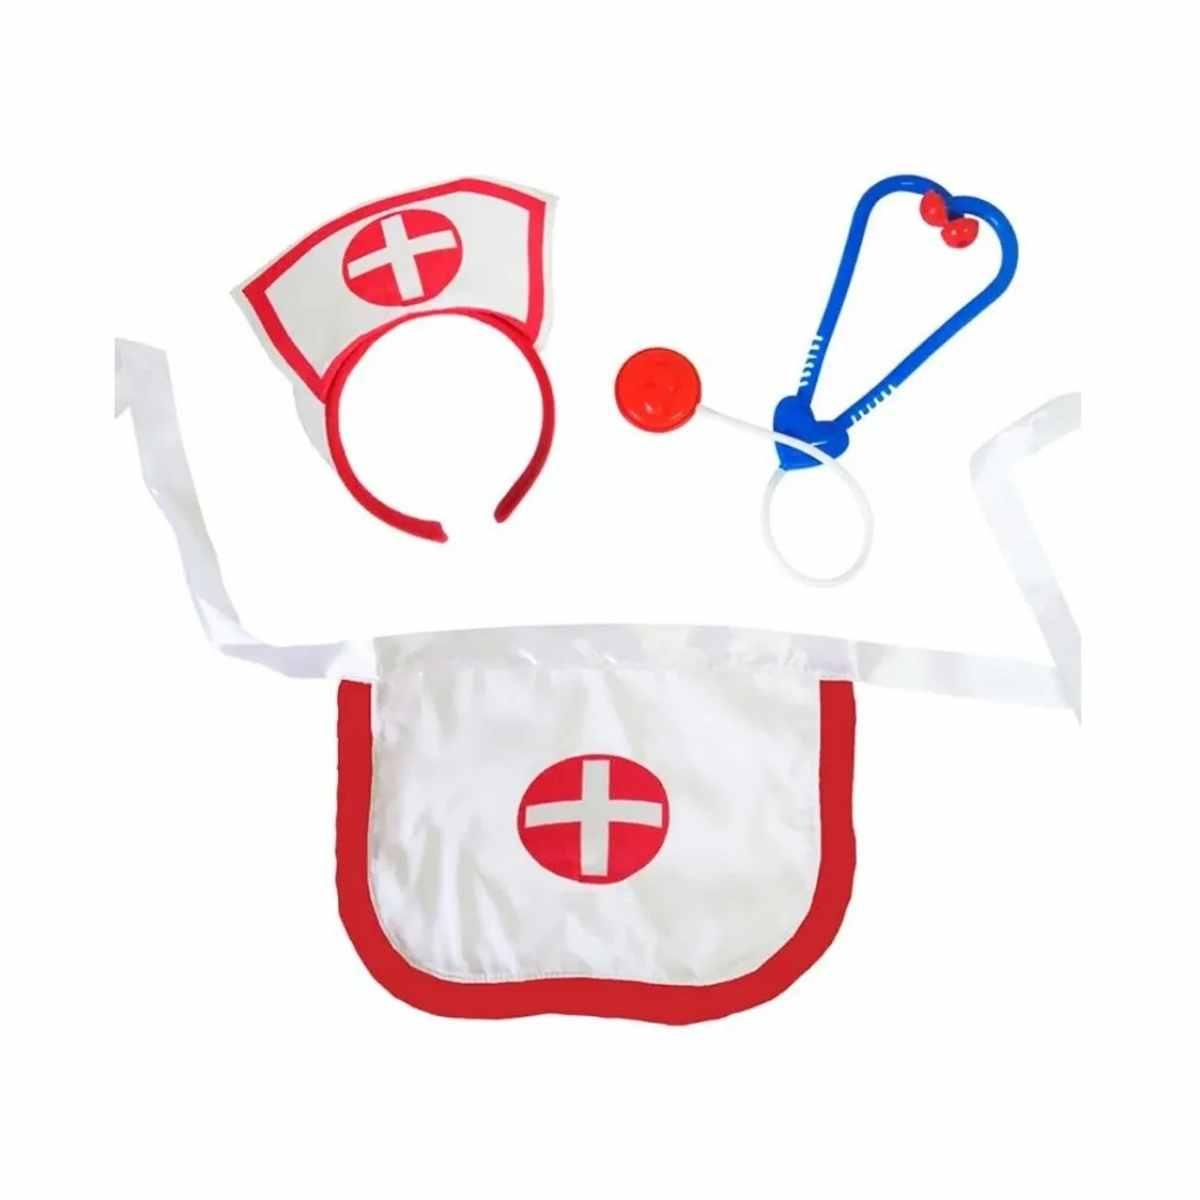 Kit Enfermeira Simples (Acessórios + Meia 7/8)